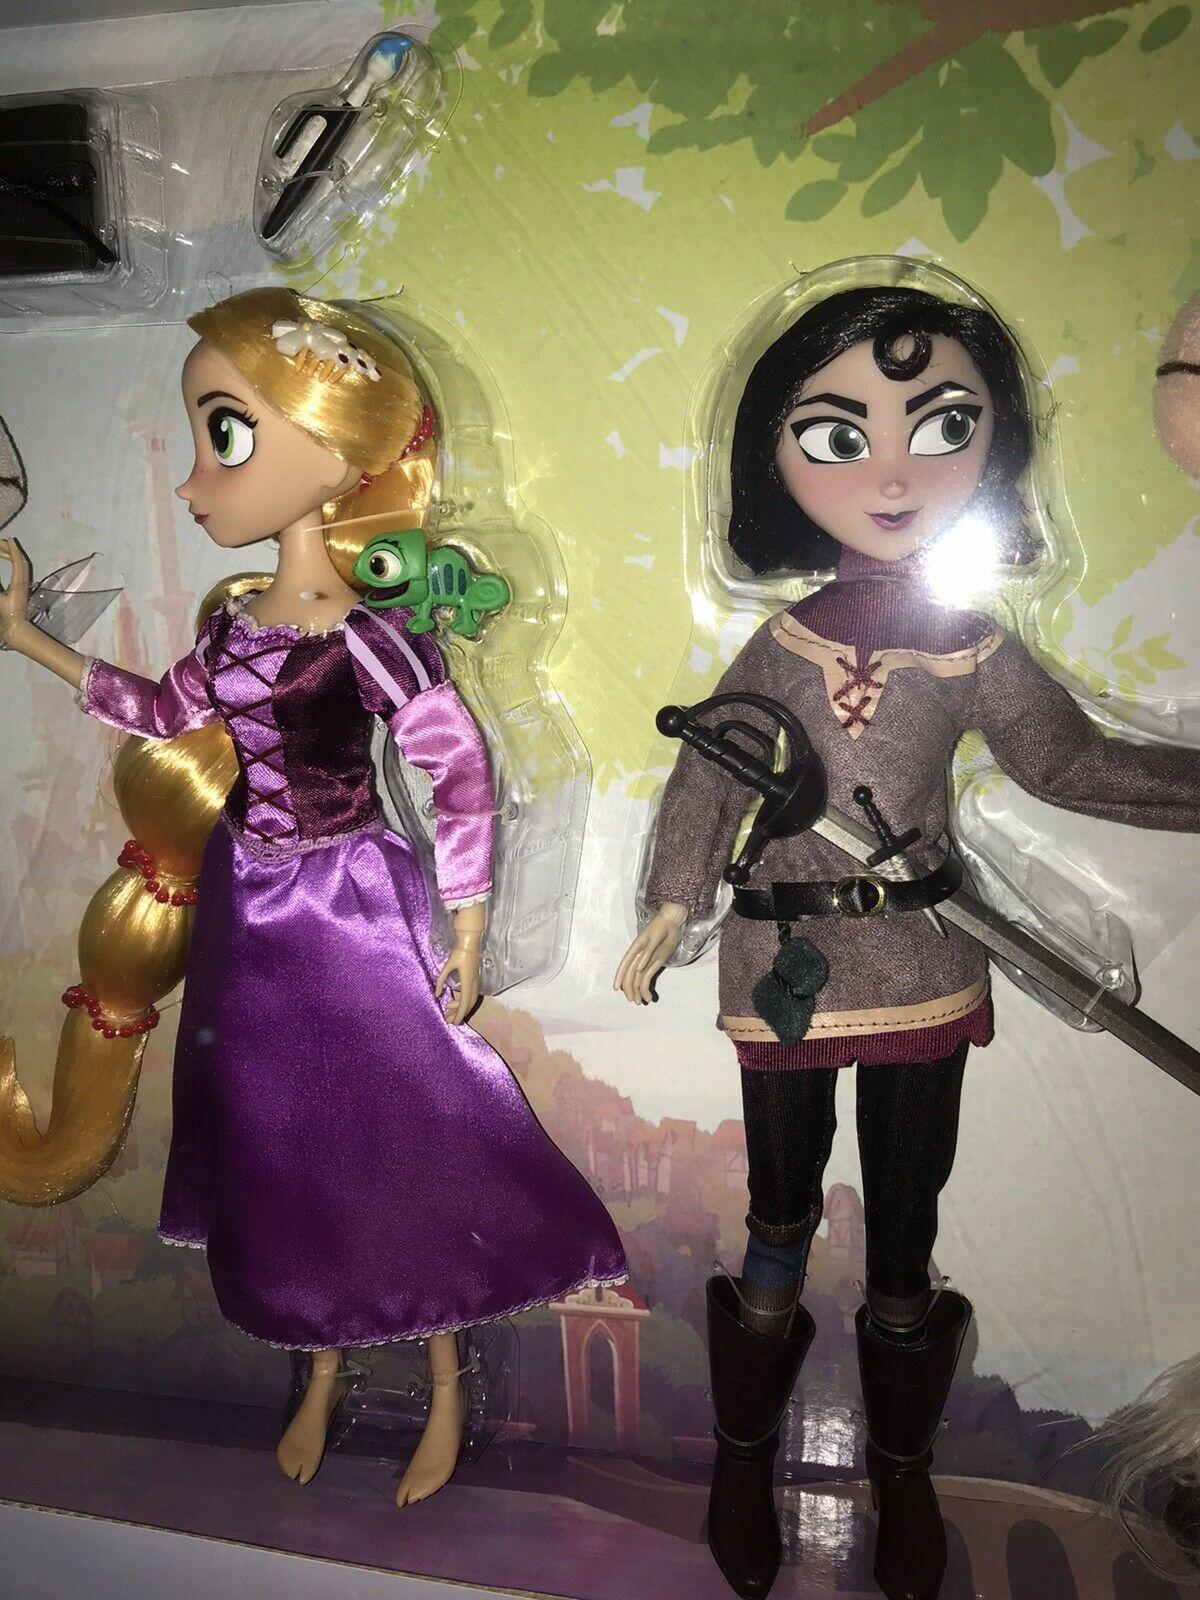 Disney Store Rapunzel And Cassandra Dolls Gift Set From Tangled The Series Nib Disney